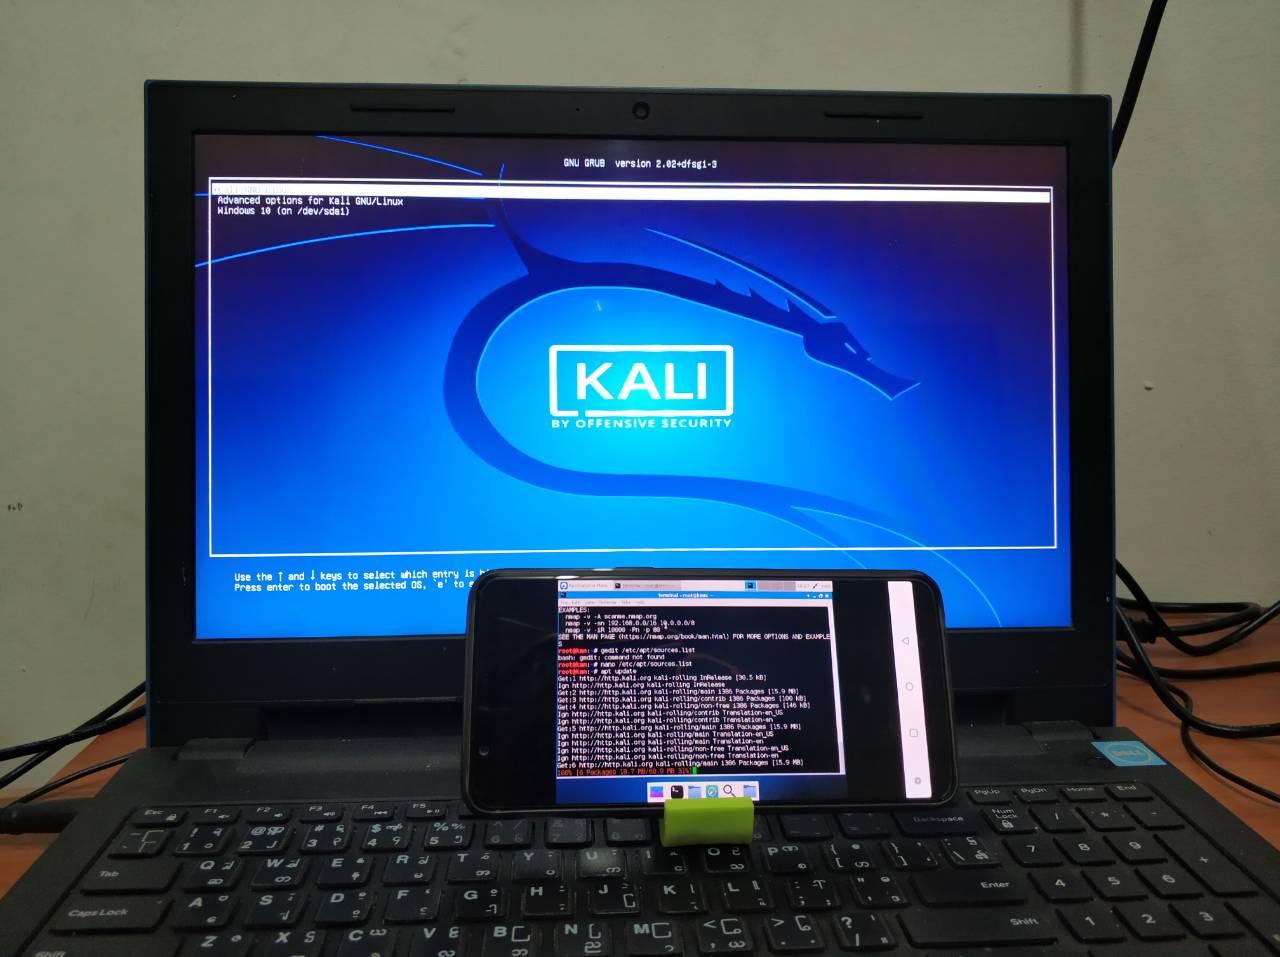 Android မှာ PC လို Kali တင်မယ် ( root ရှိရှိ